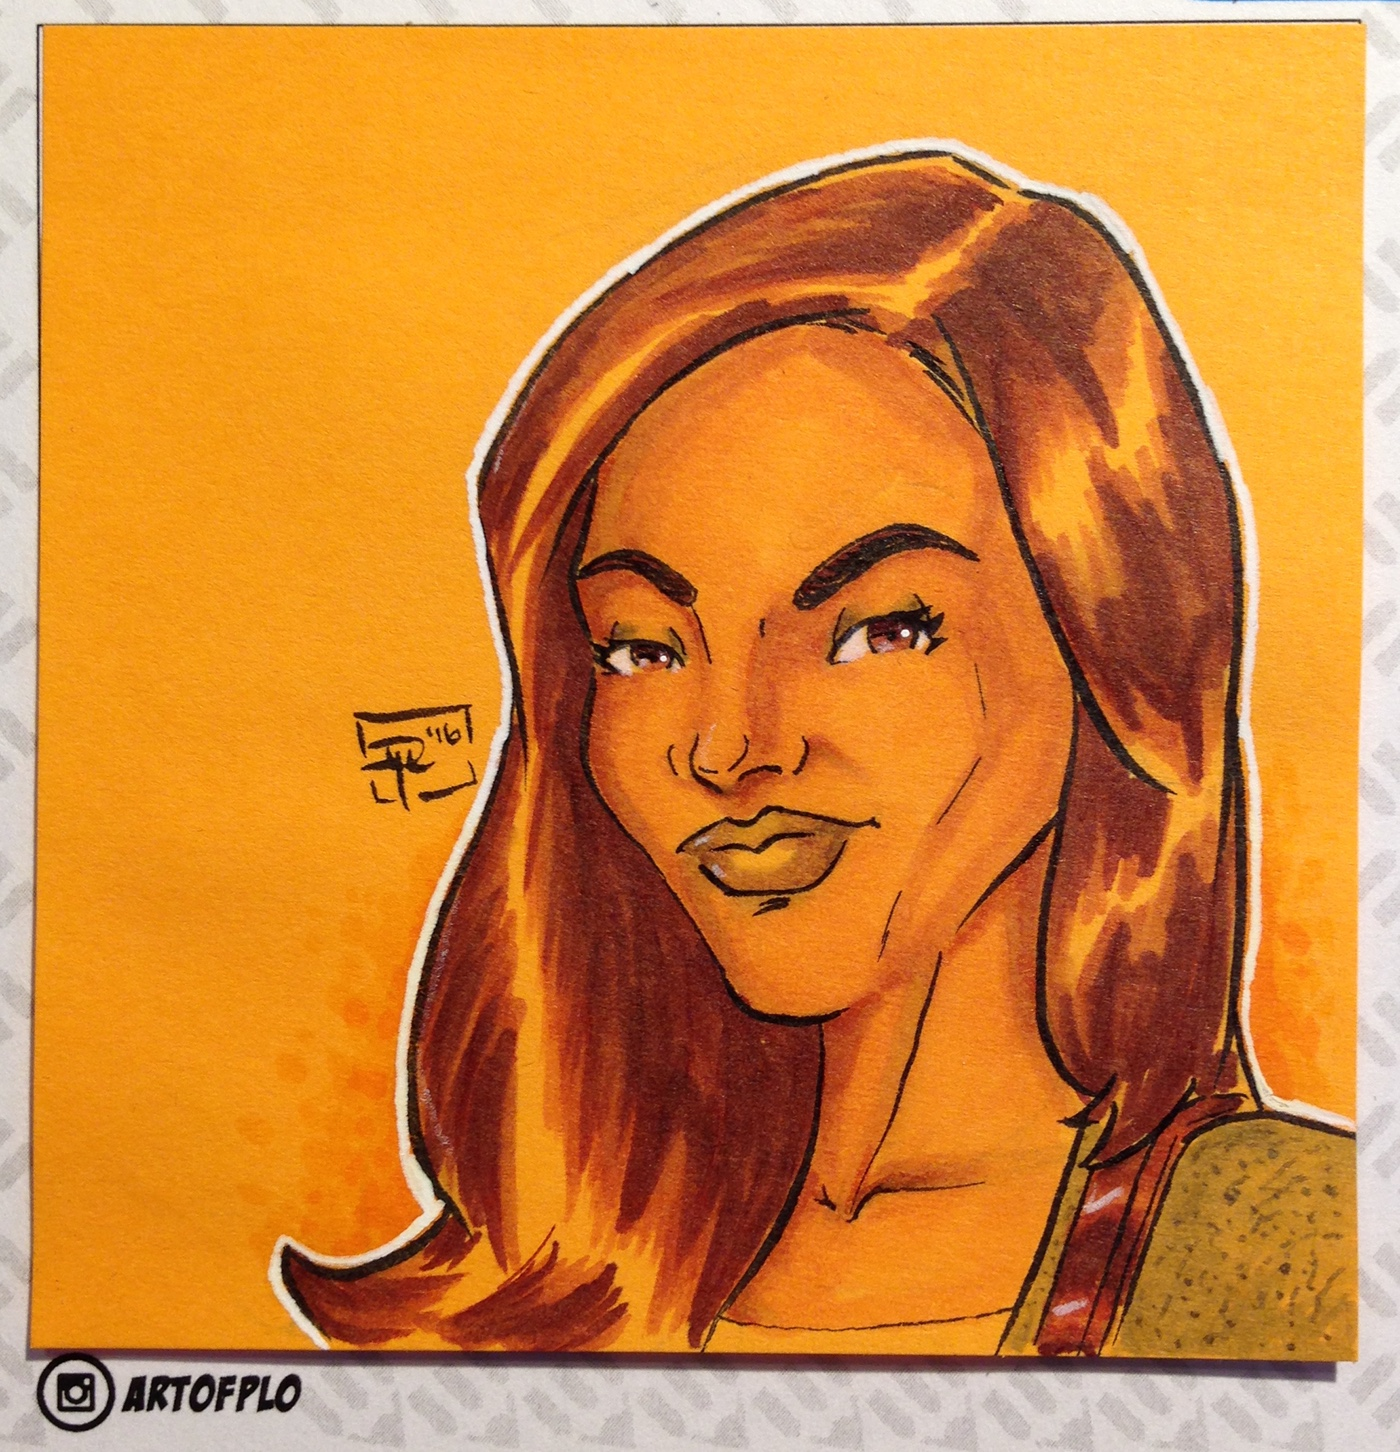 Post-it marvel Dc Comics Netflix Copic larios Drawing  hand drawn